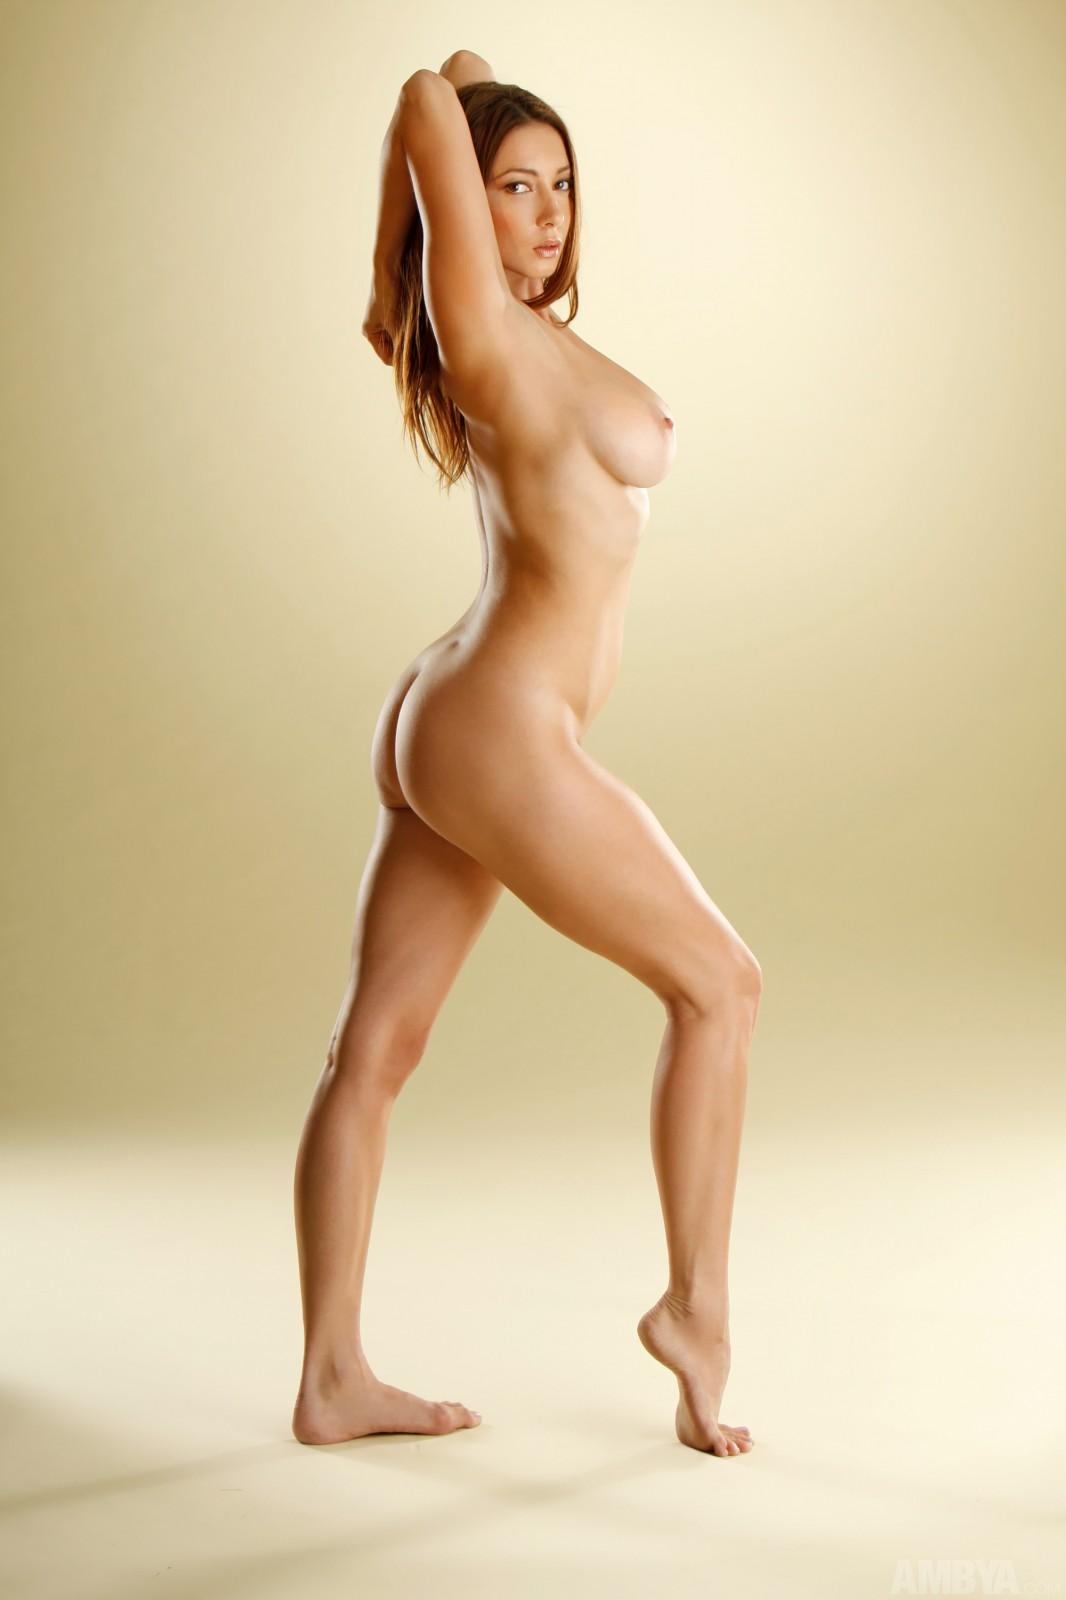 julia mancuso naked ass